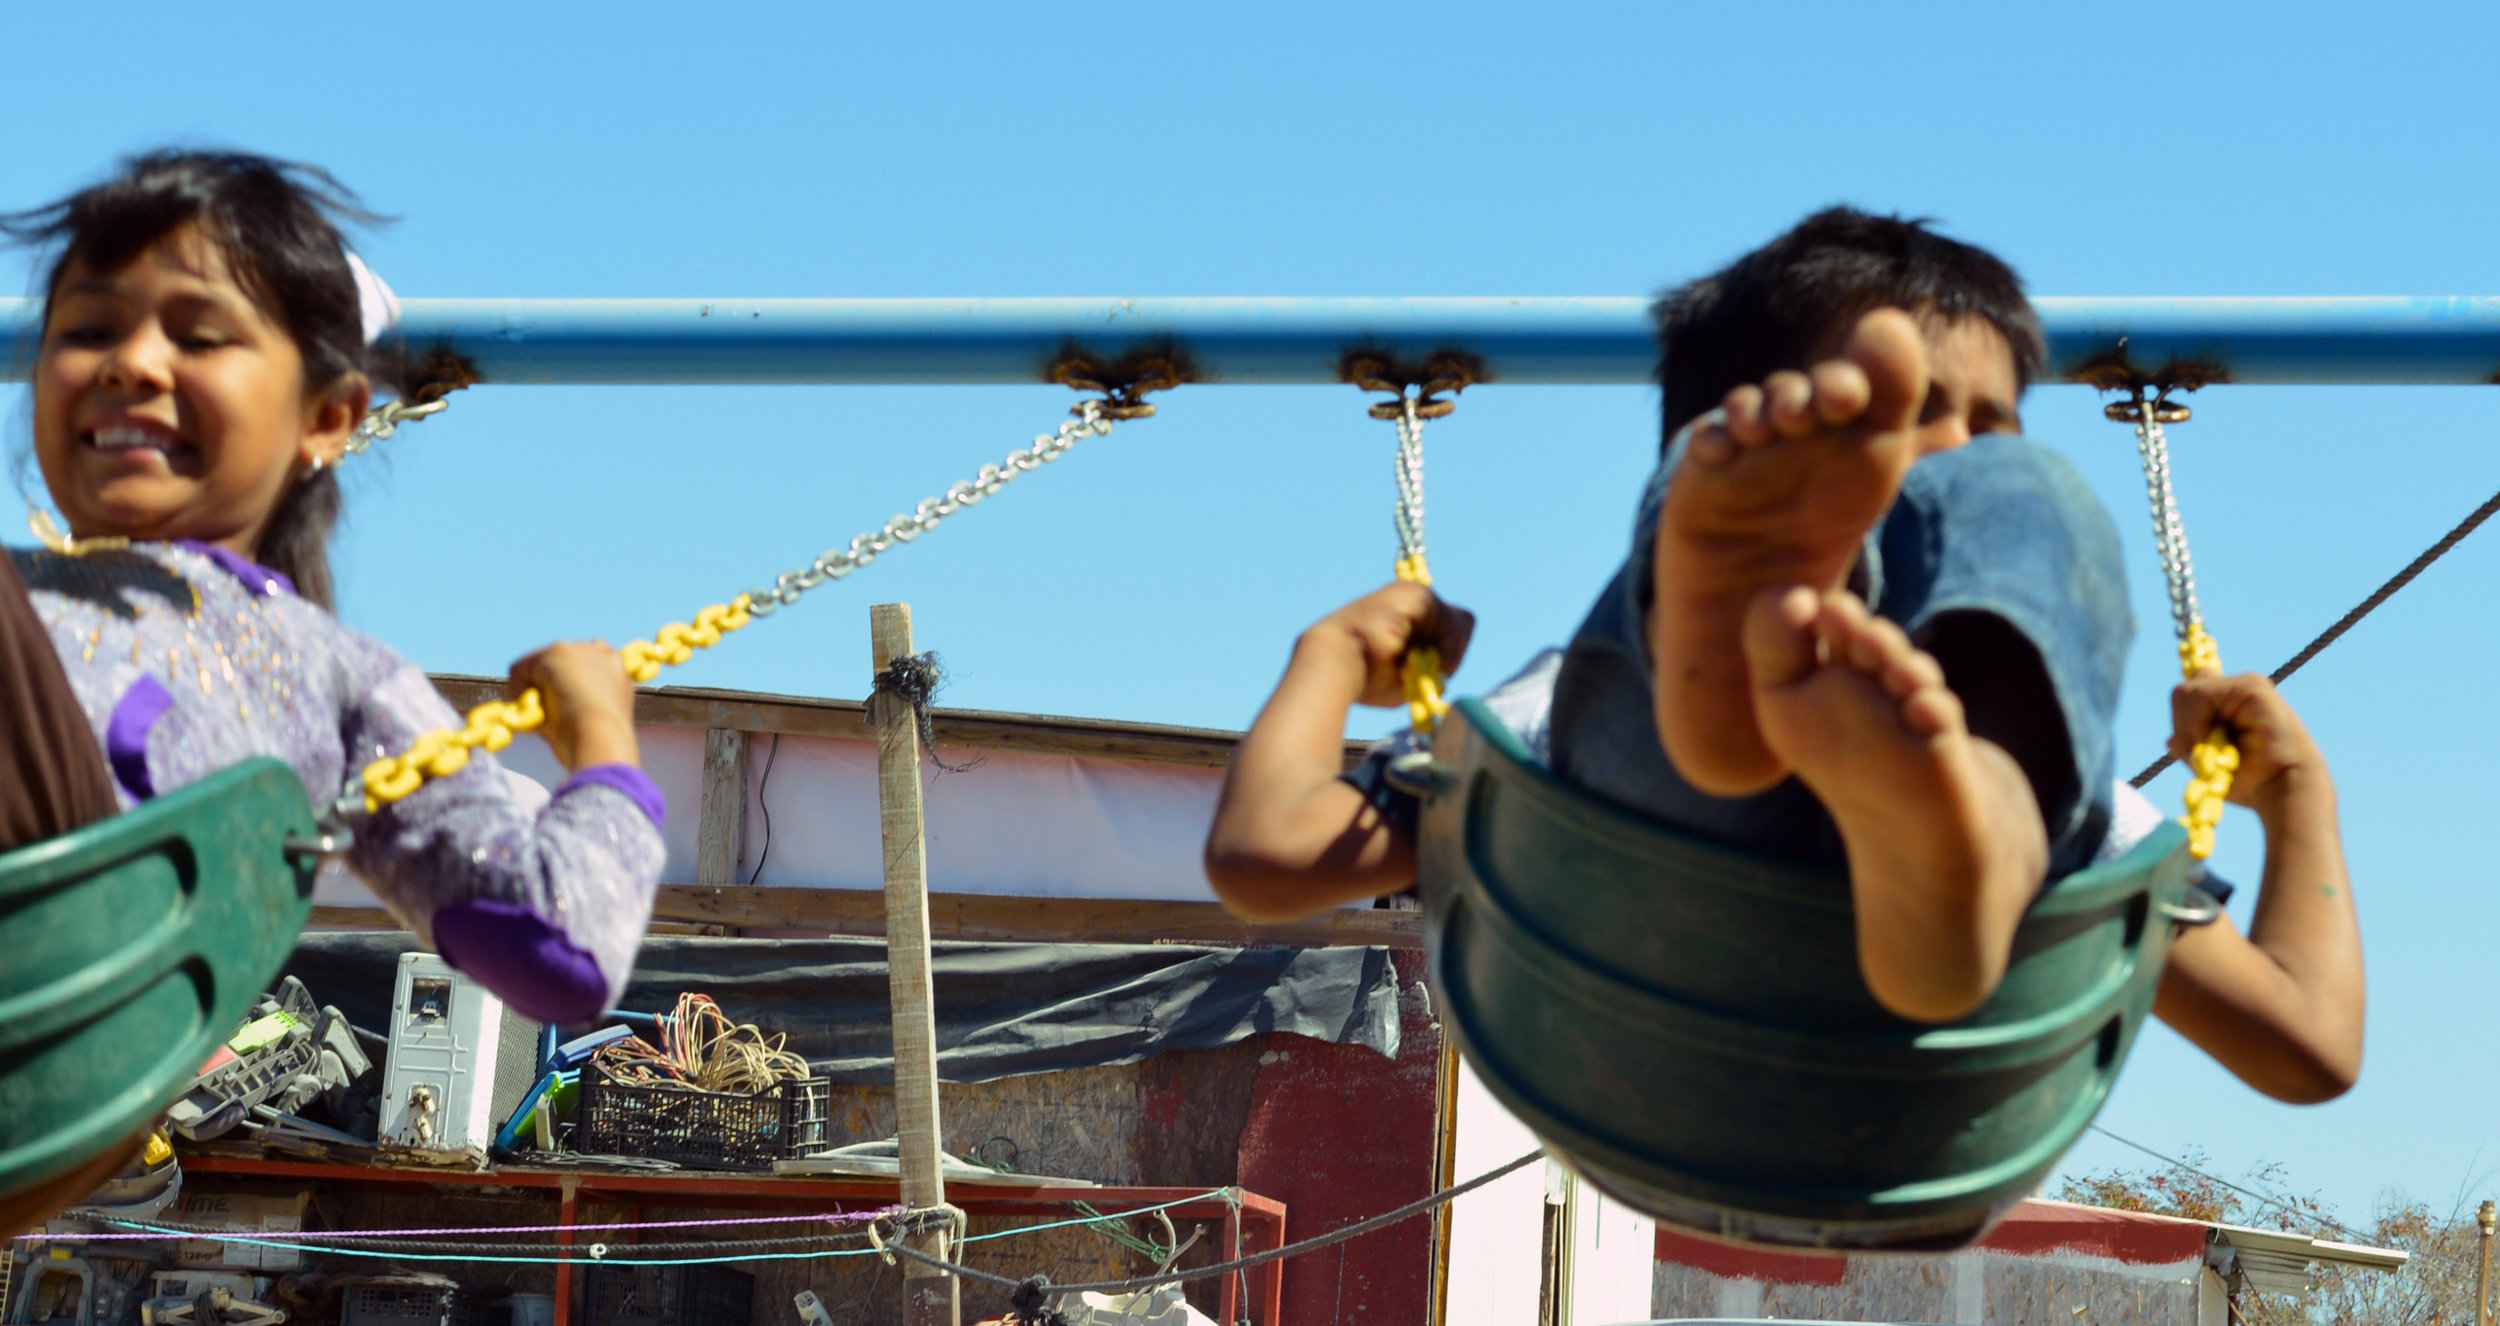 Swinging around at the children's rehab facility - Global Dish - Stephanie Arsenault